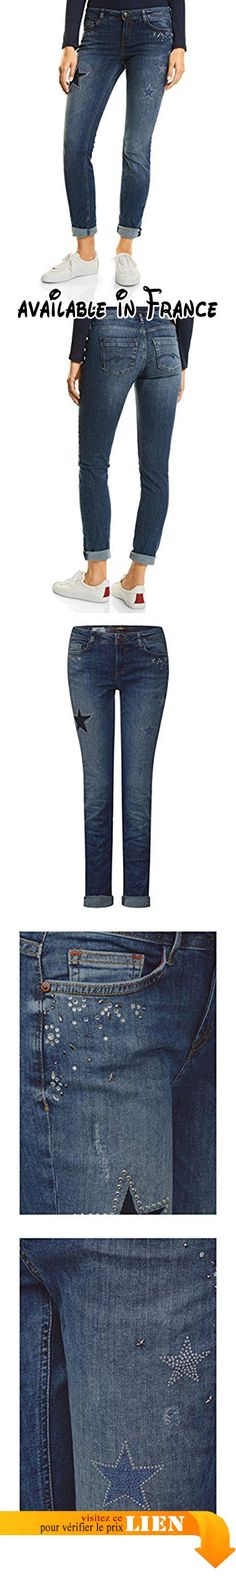 B073YDNSMK : Street One Denim-Jane Casualfit Mw Slimleg Sparkle Jean Slim Femme Blau (Authentic Blue Sparkling Wash 11140) W44/L30.